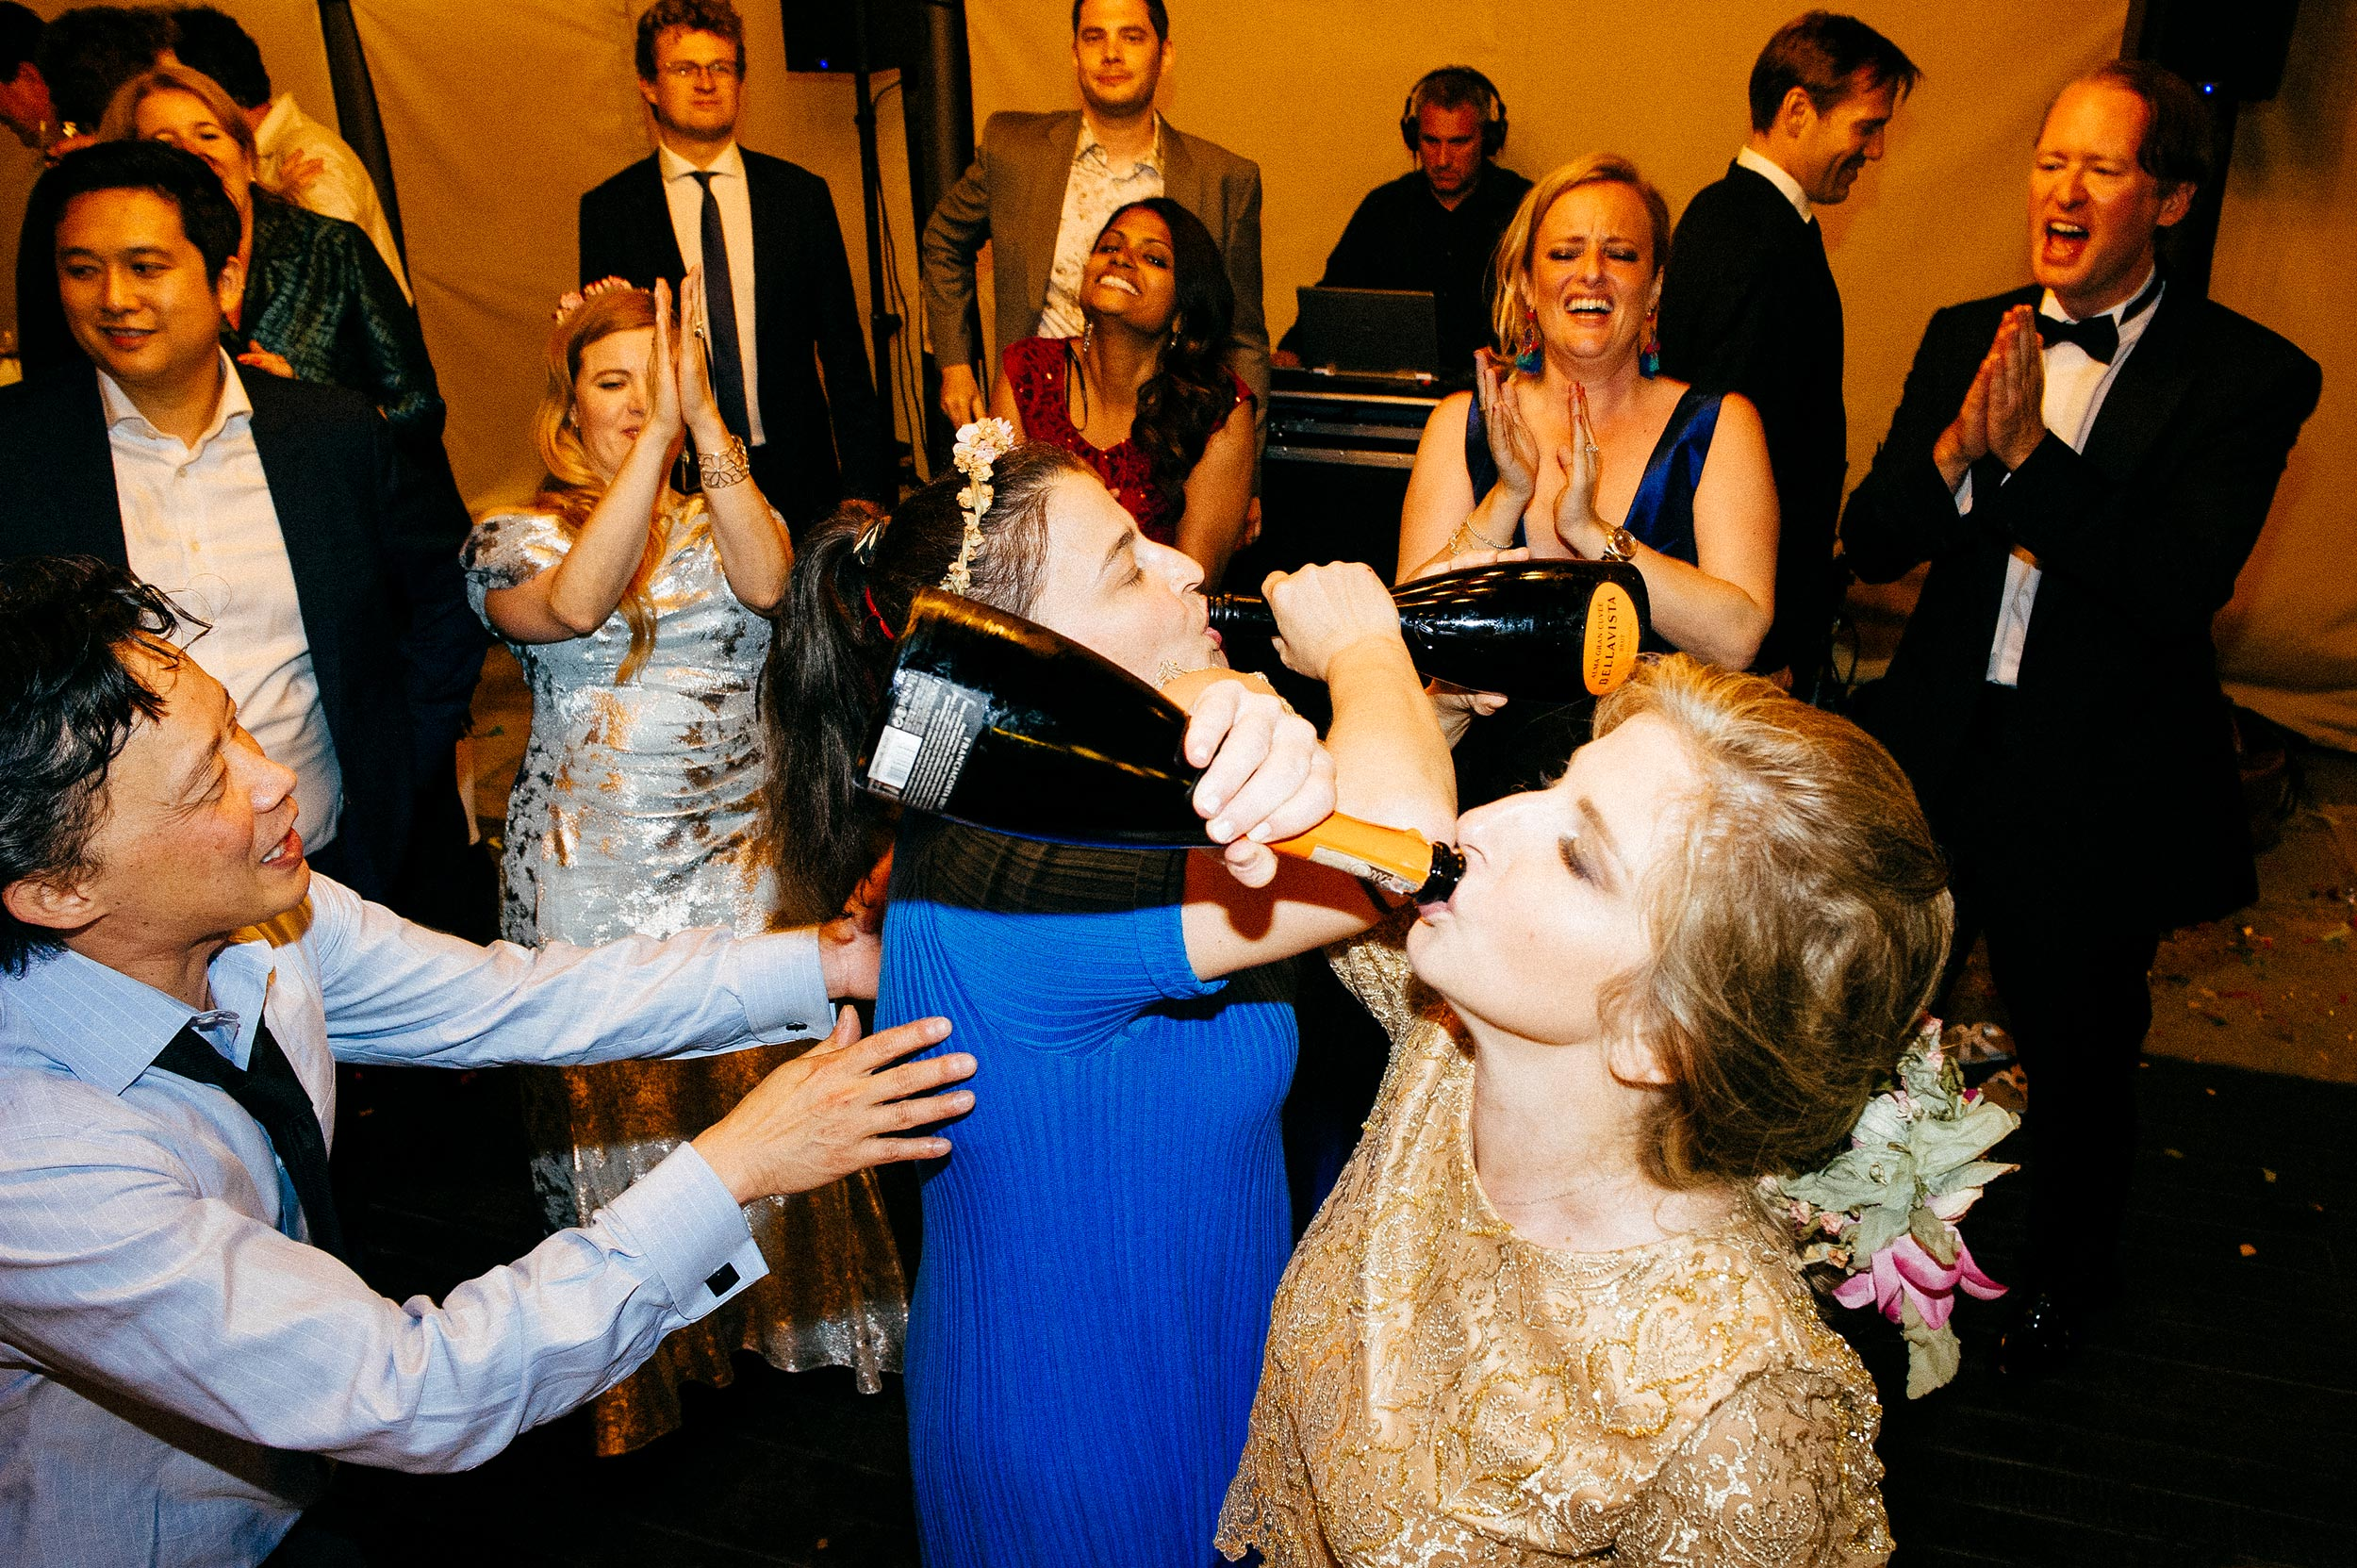 wedding-villa-beccaris-langhe-italy-monforte-alba-crazy-party-documentary-photography-by-Alessandro-Avenali.jpg